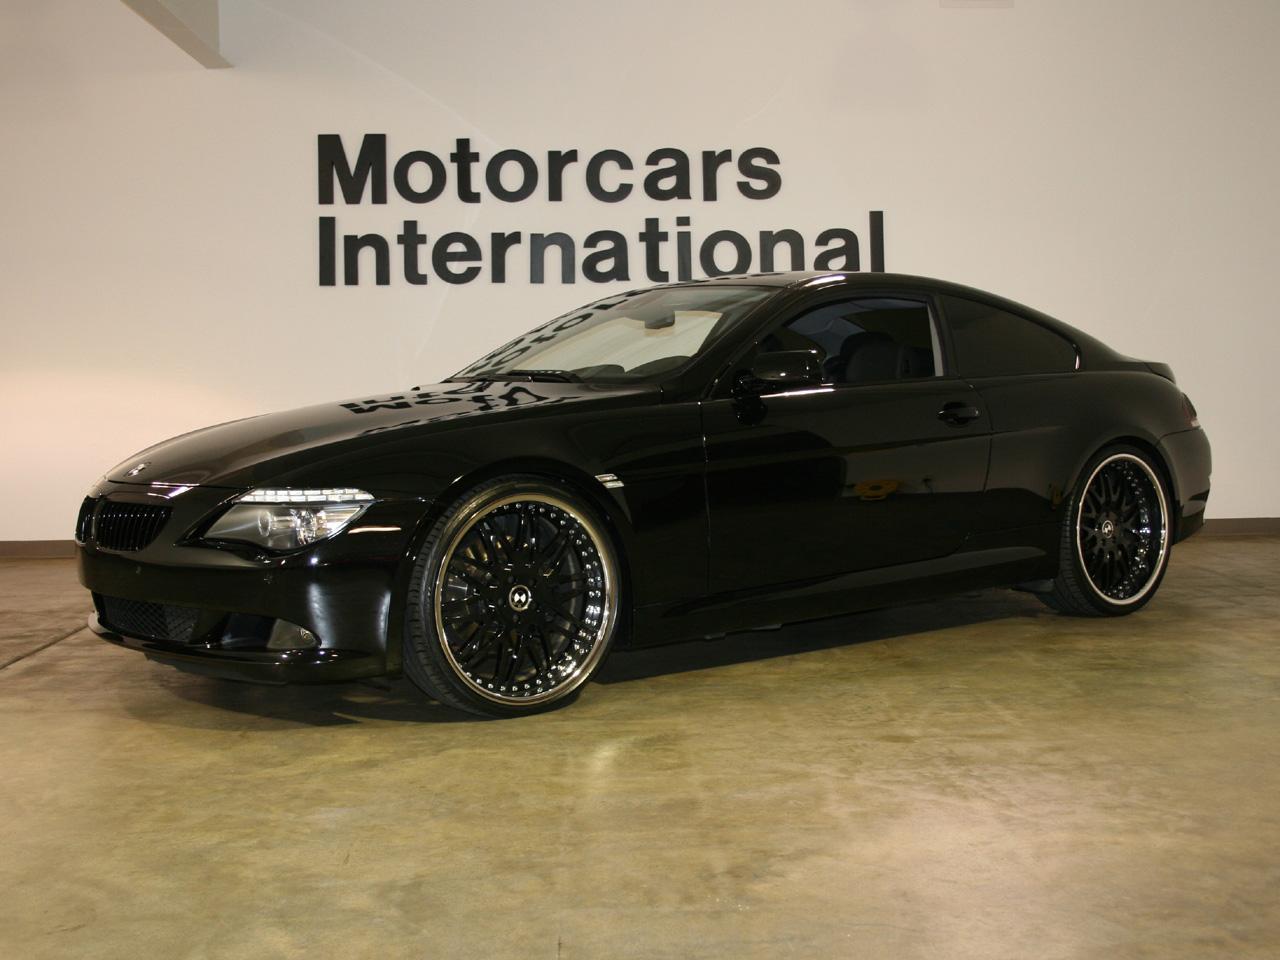 2008 BMW 650i Coupe